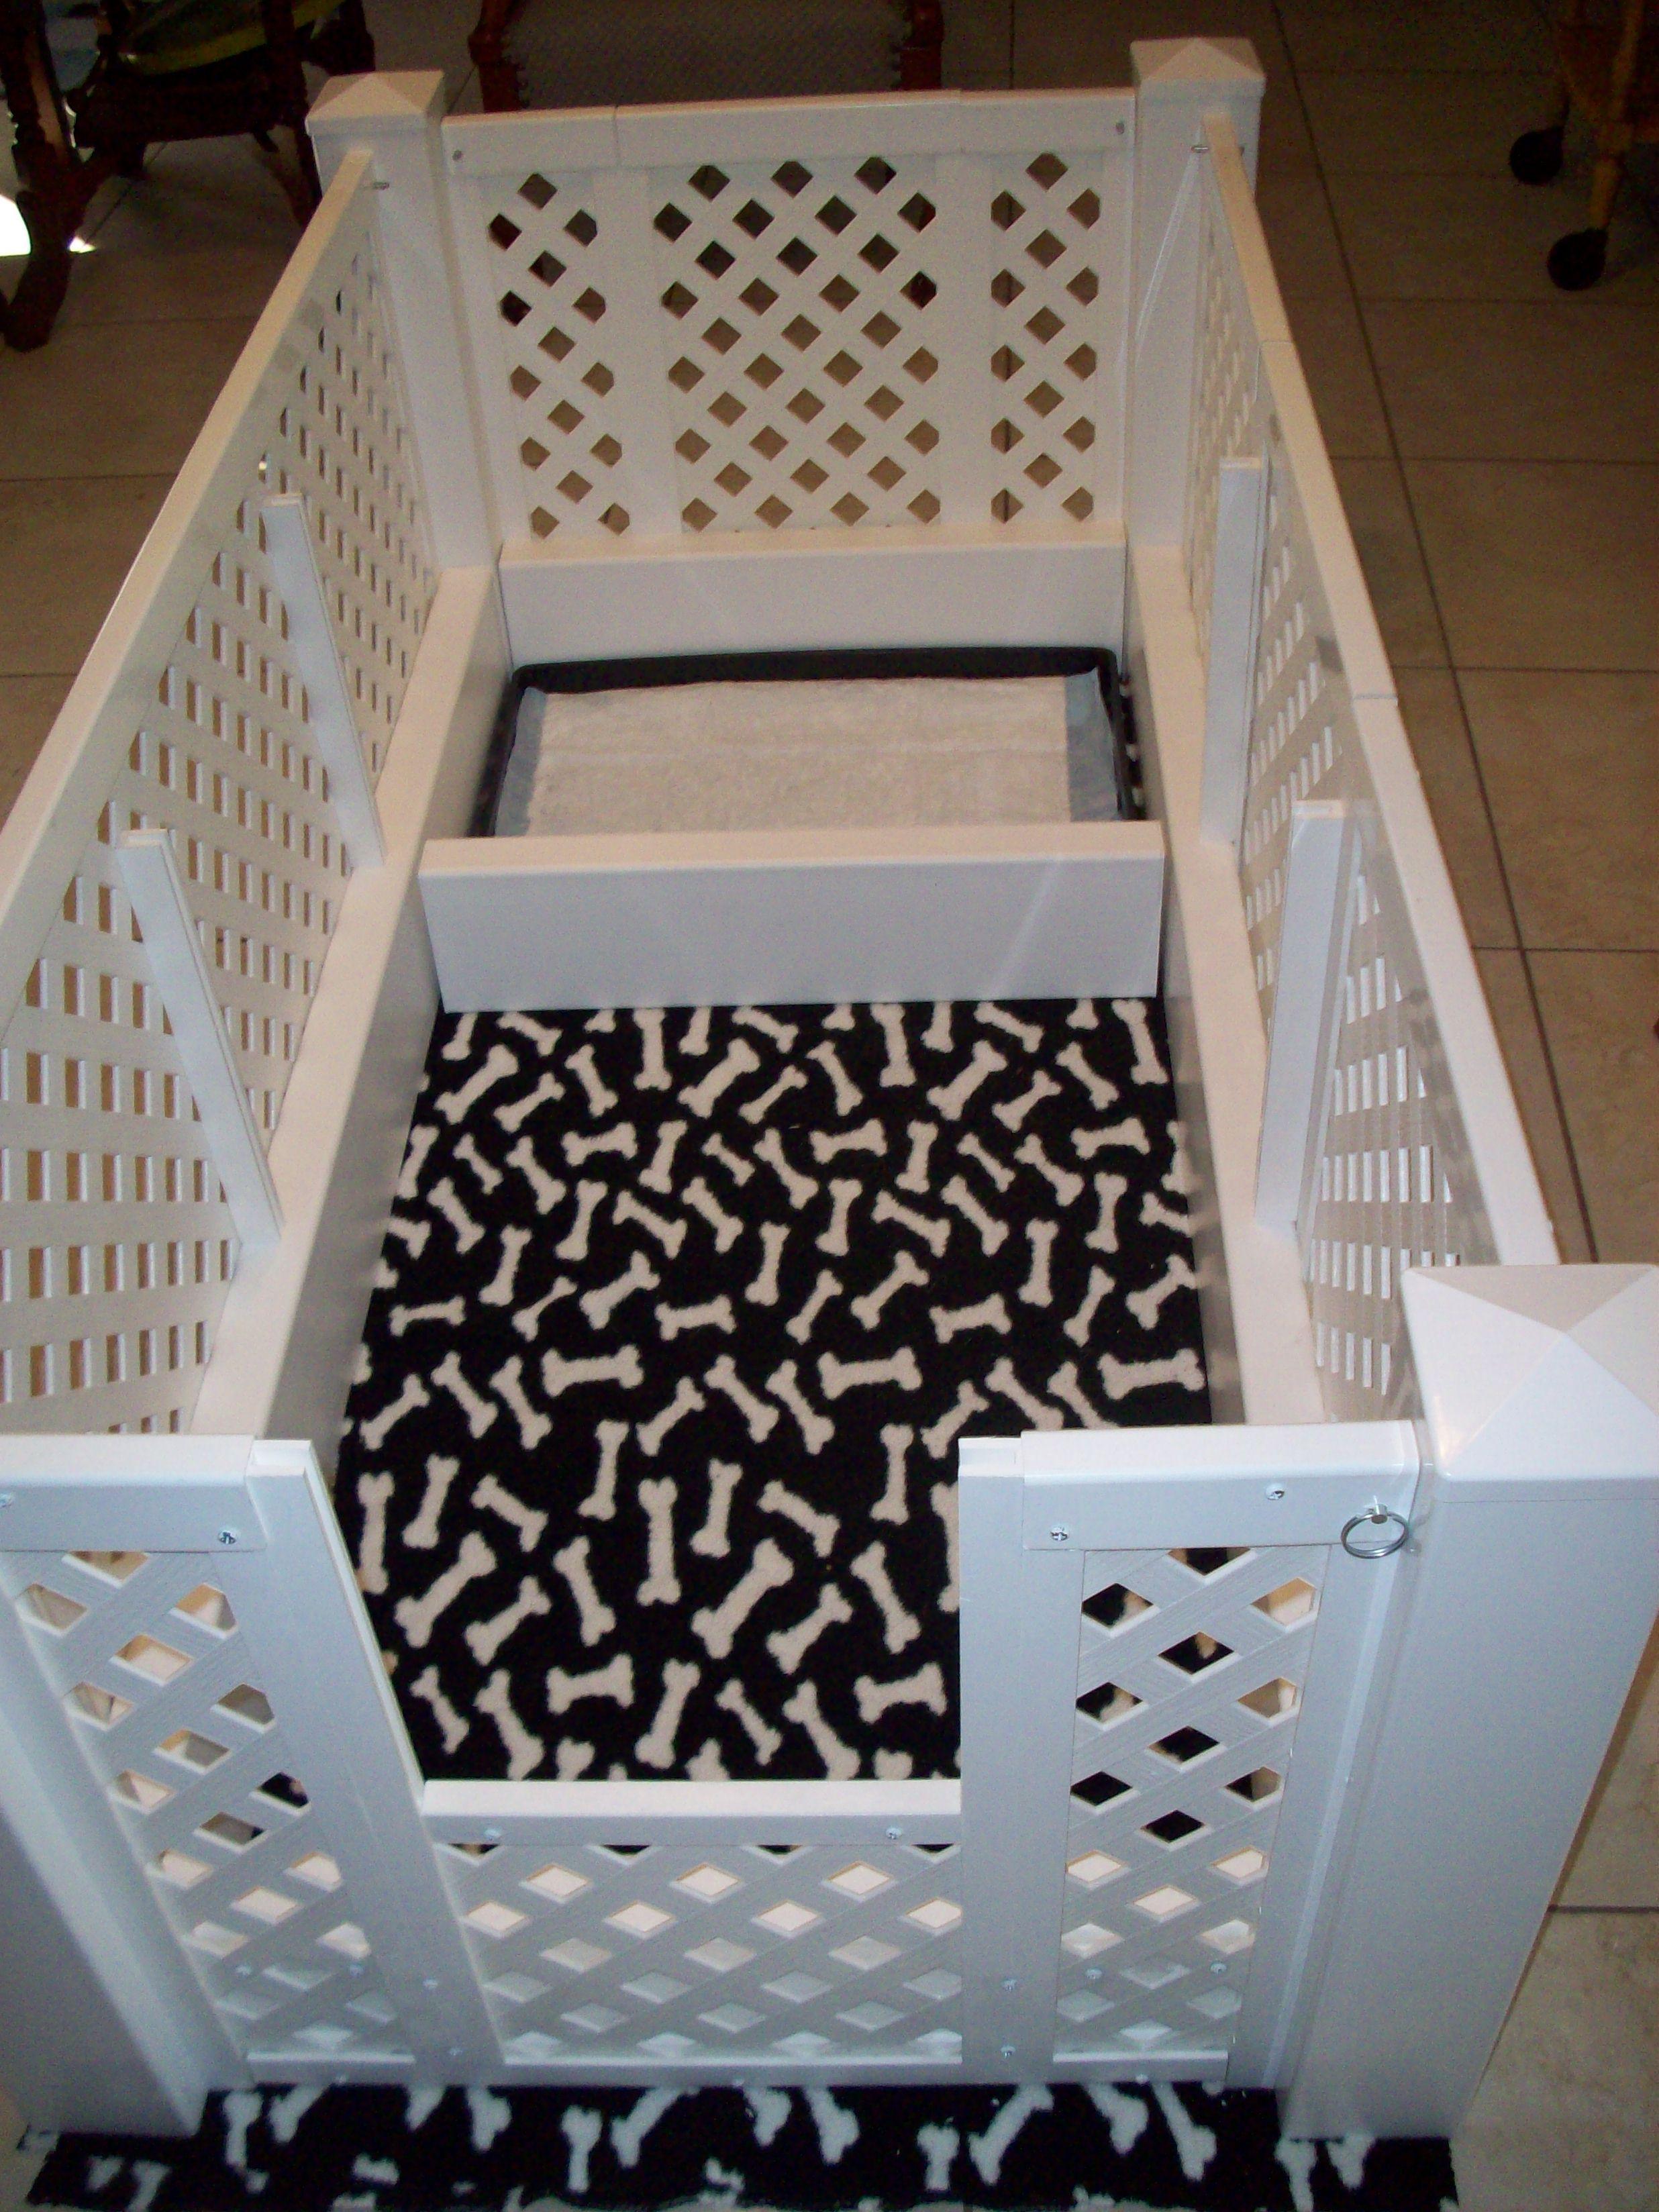 Why Whelp & Gro My Whelping Box Dynamic Whelping box